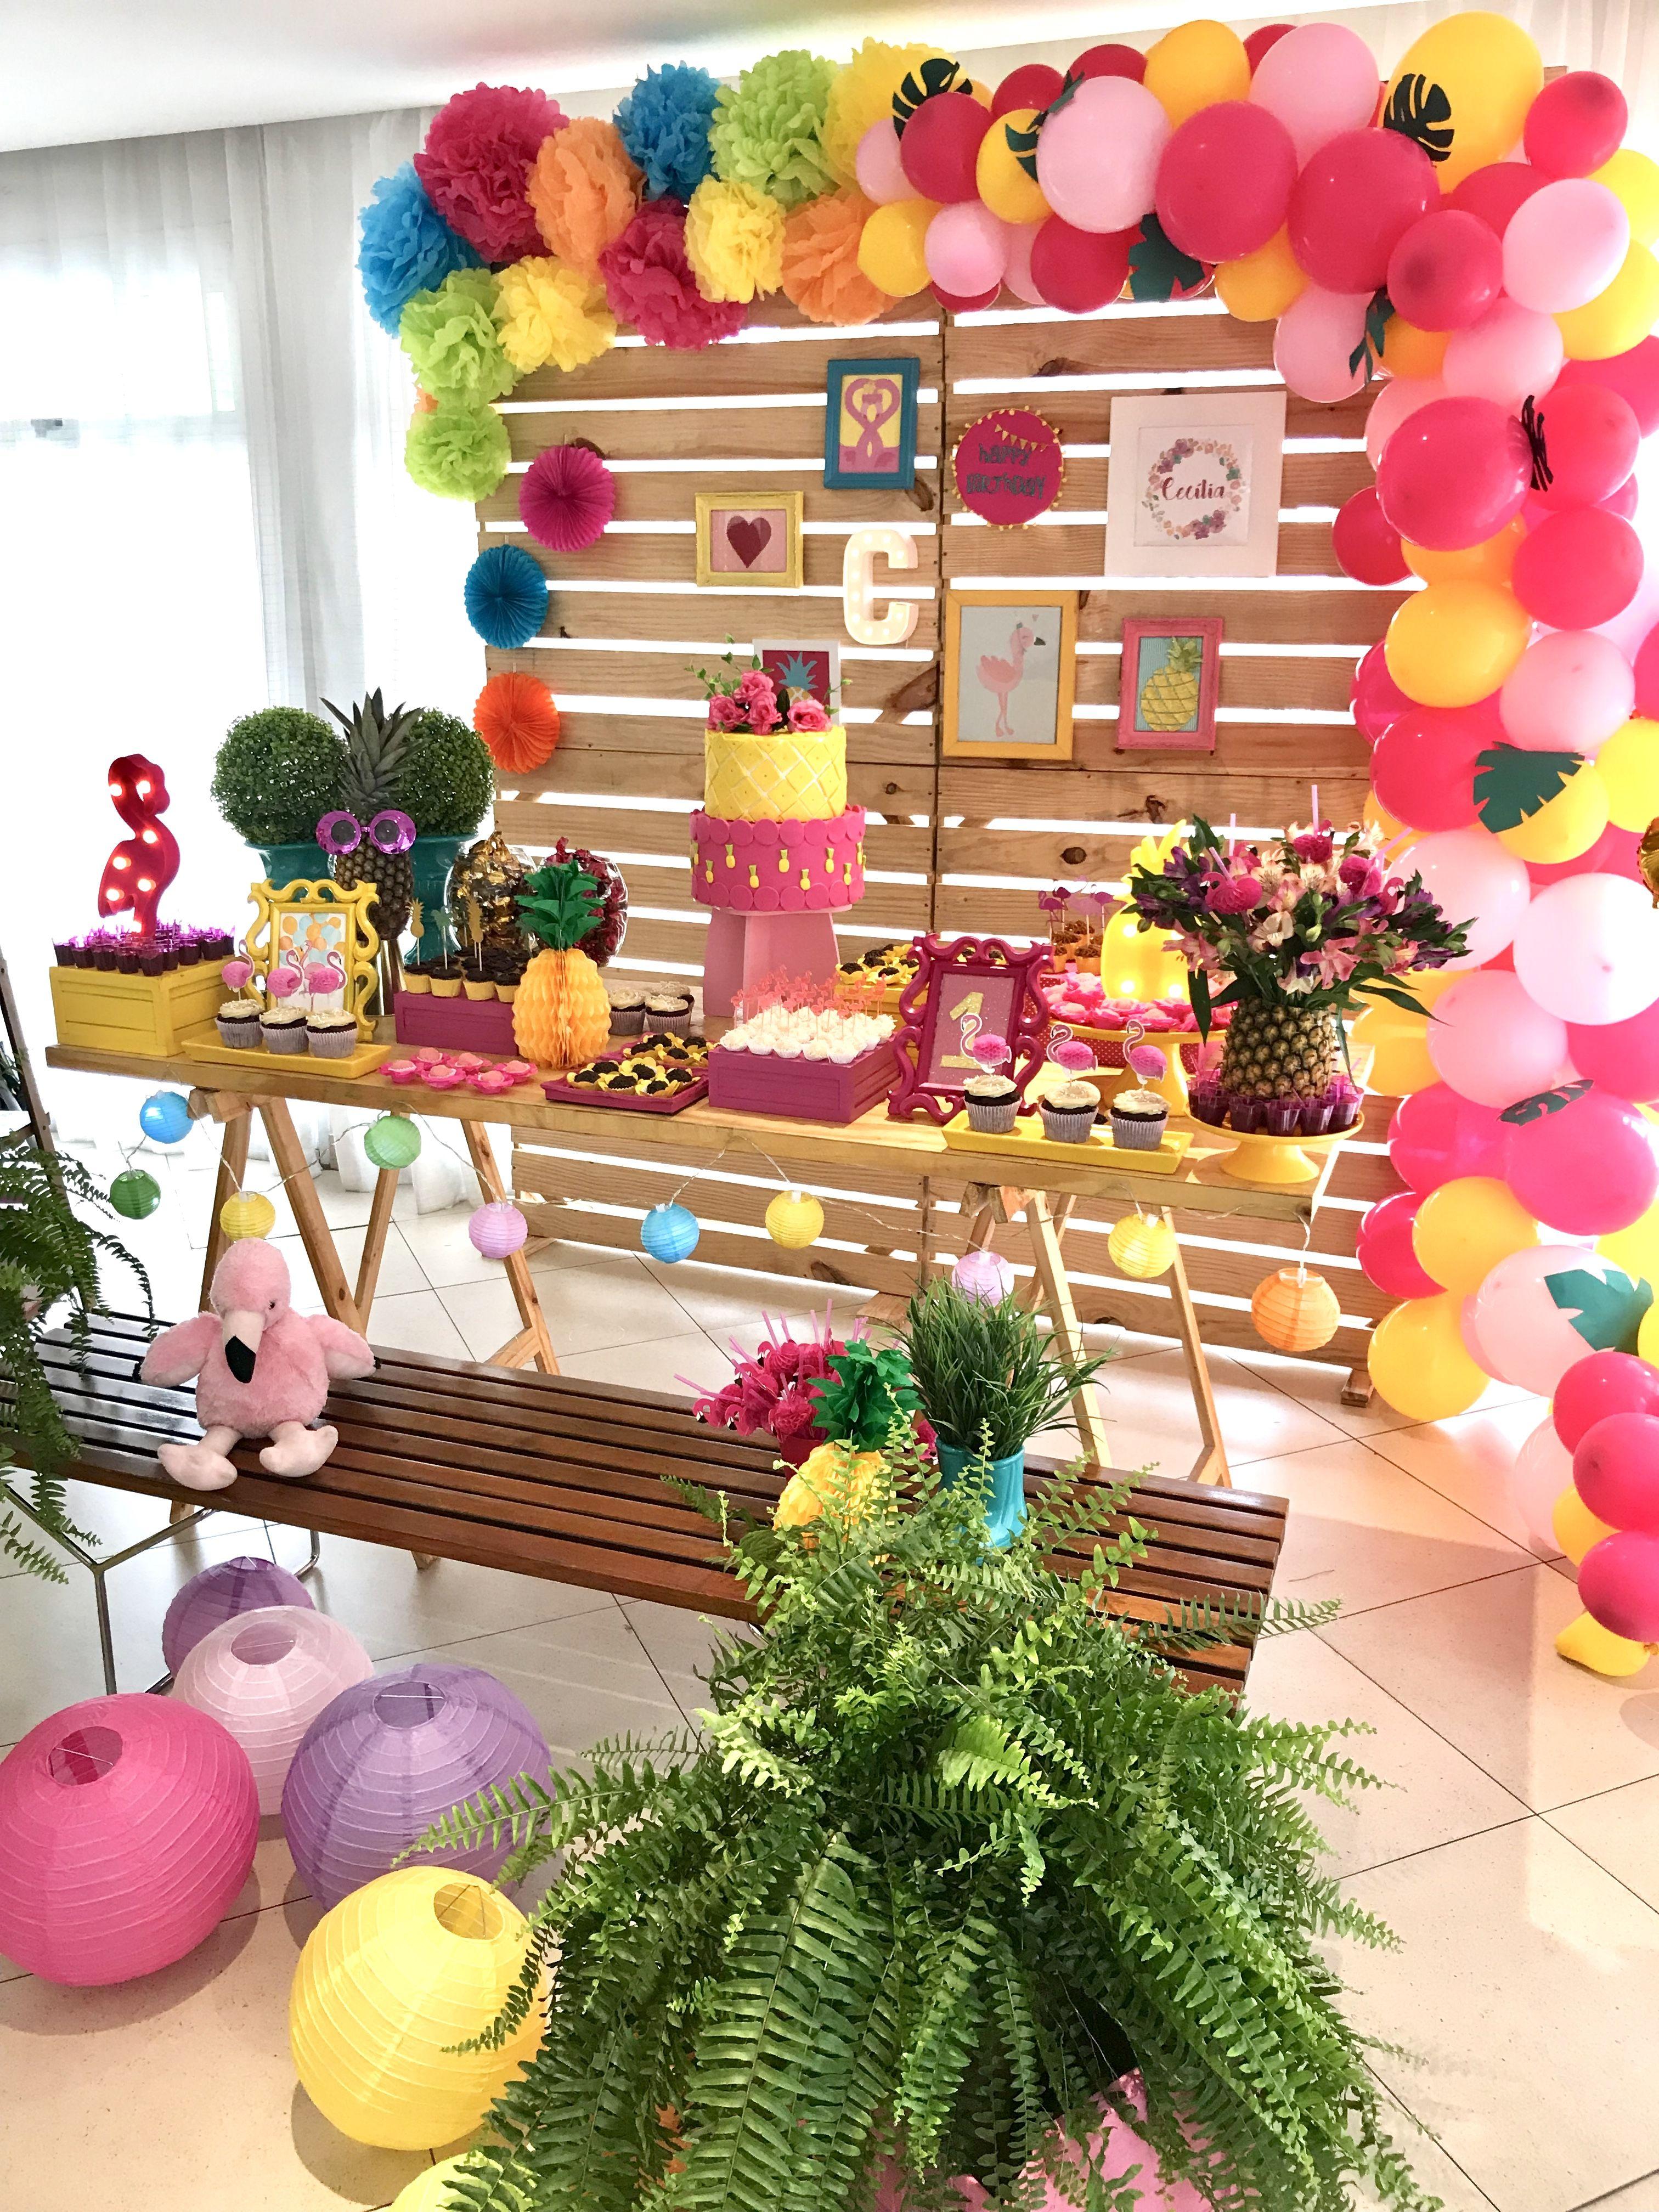 pin by maria olivia moraes on party ideas pinterest flamingo